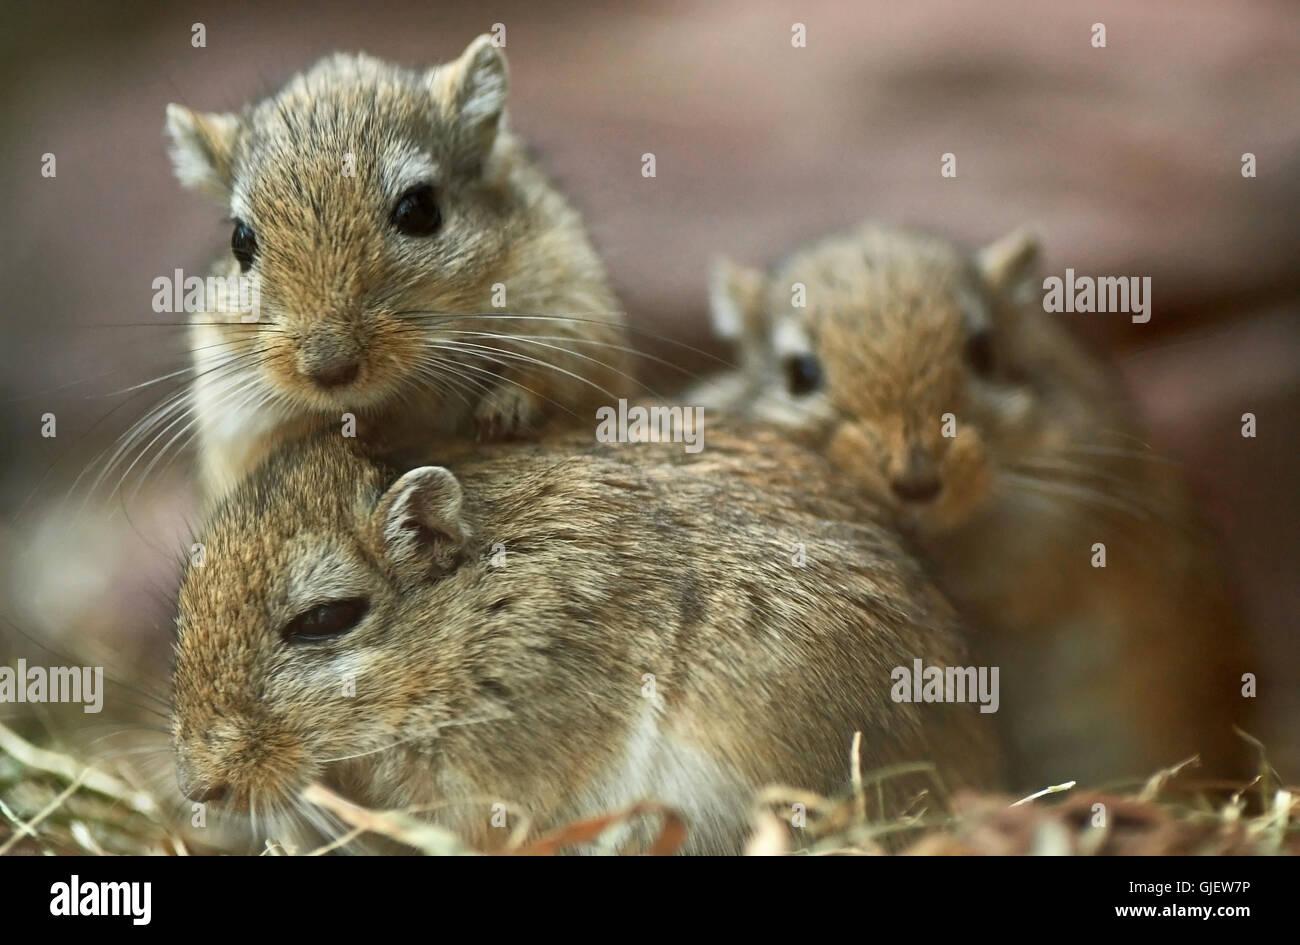 arme kleine Maus (2) Stockbild